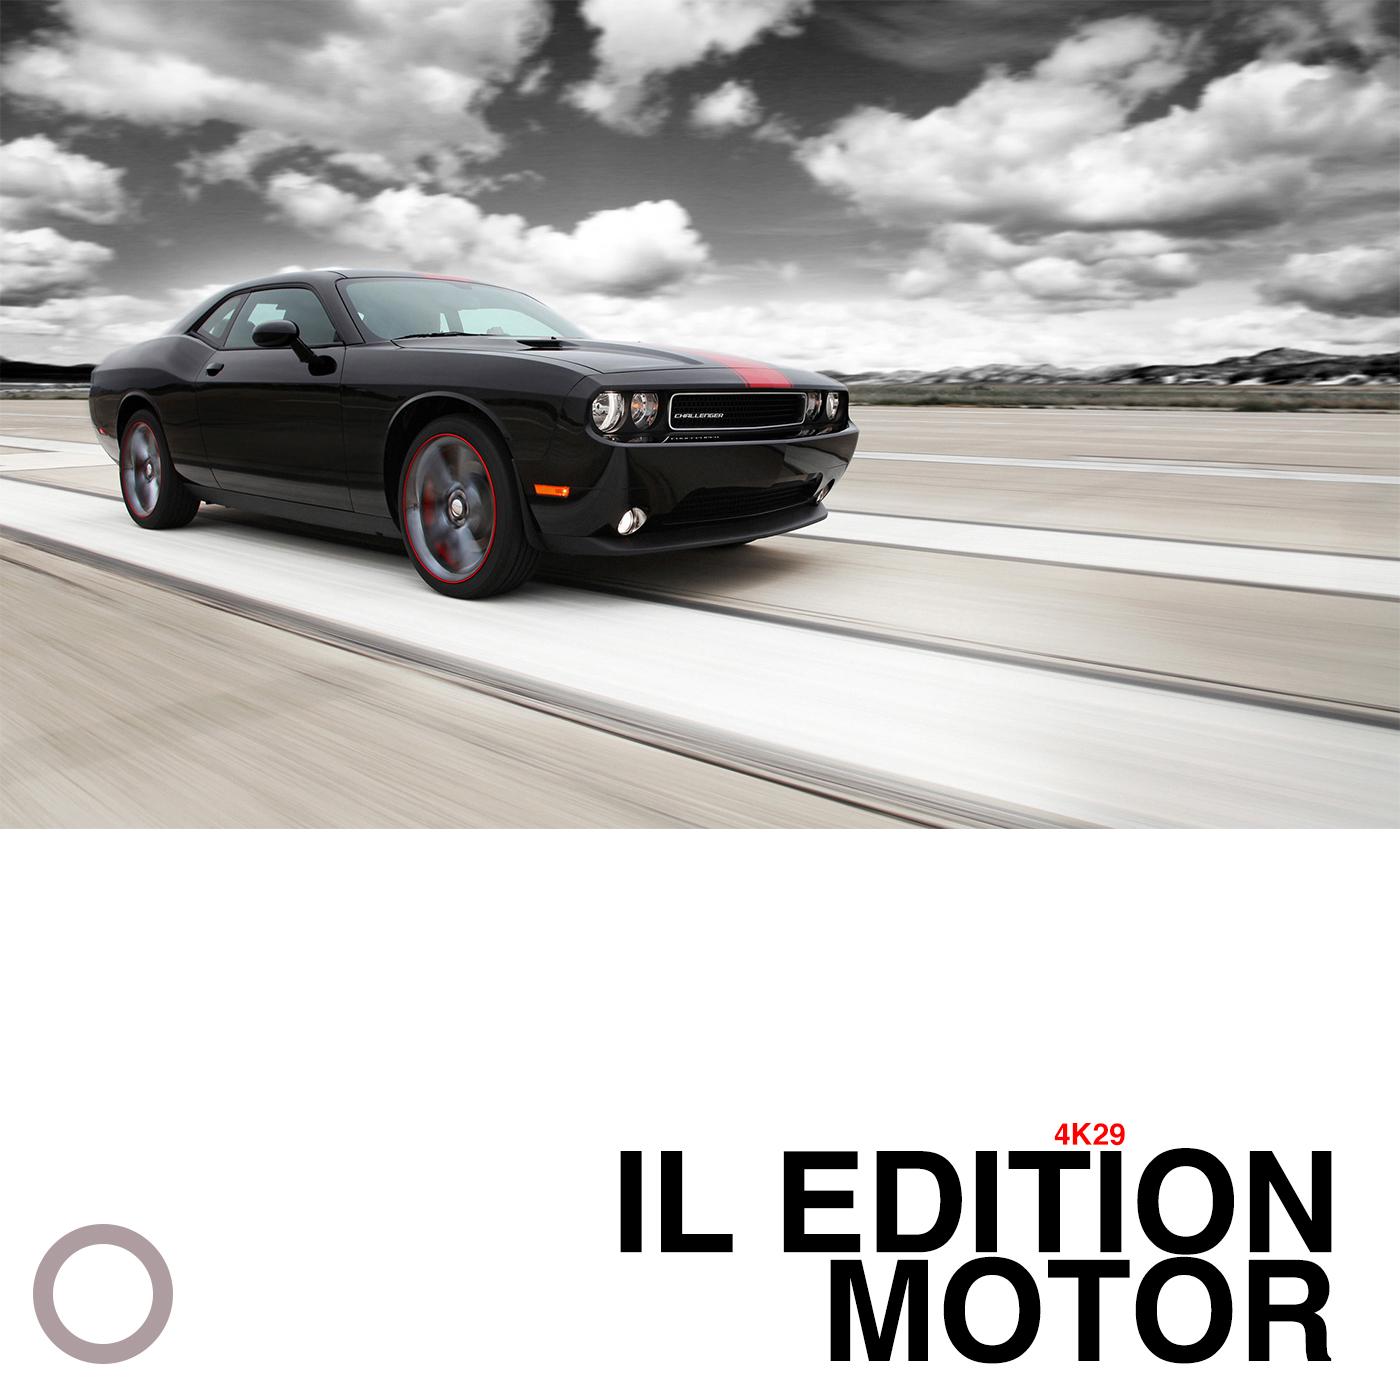 IL EDITION MOTOR 4K29